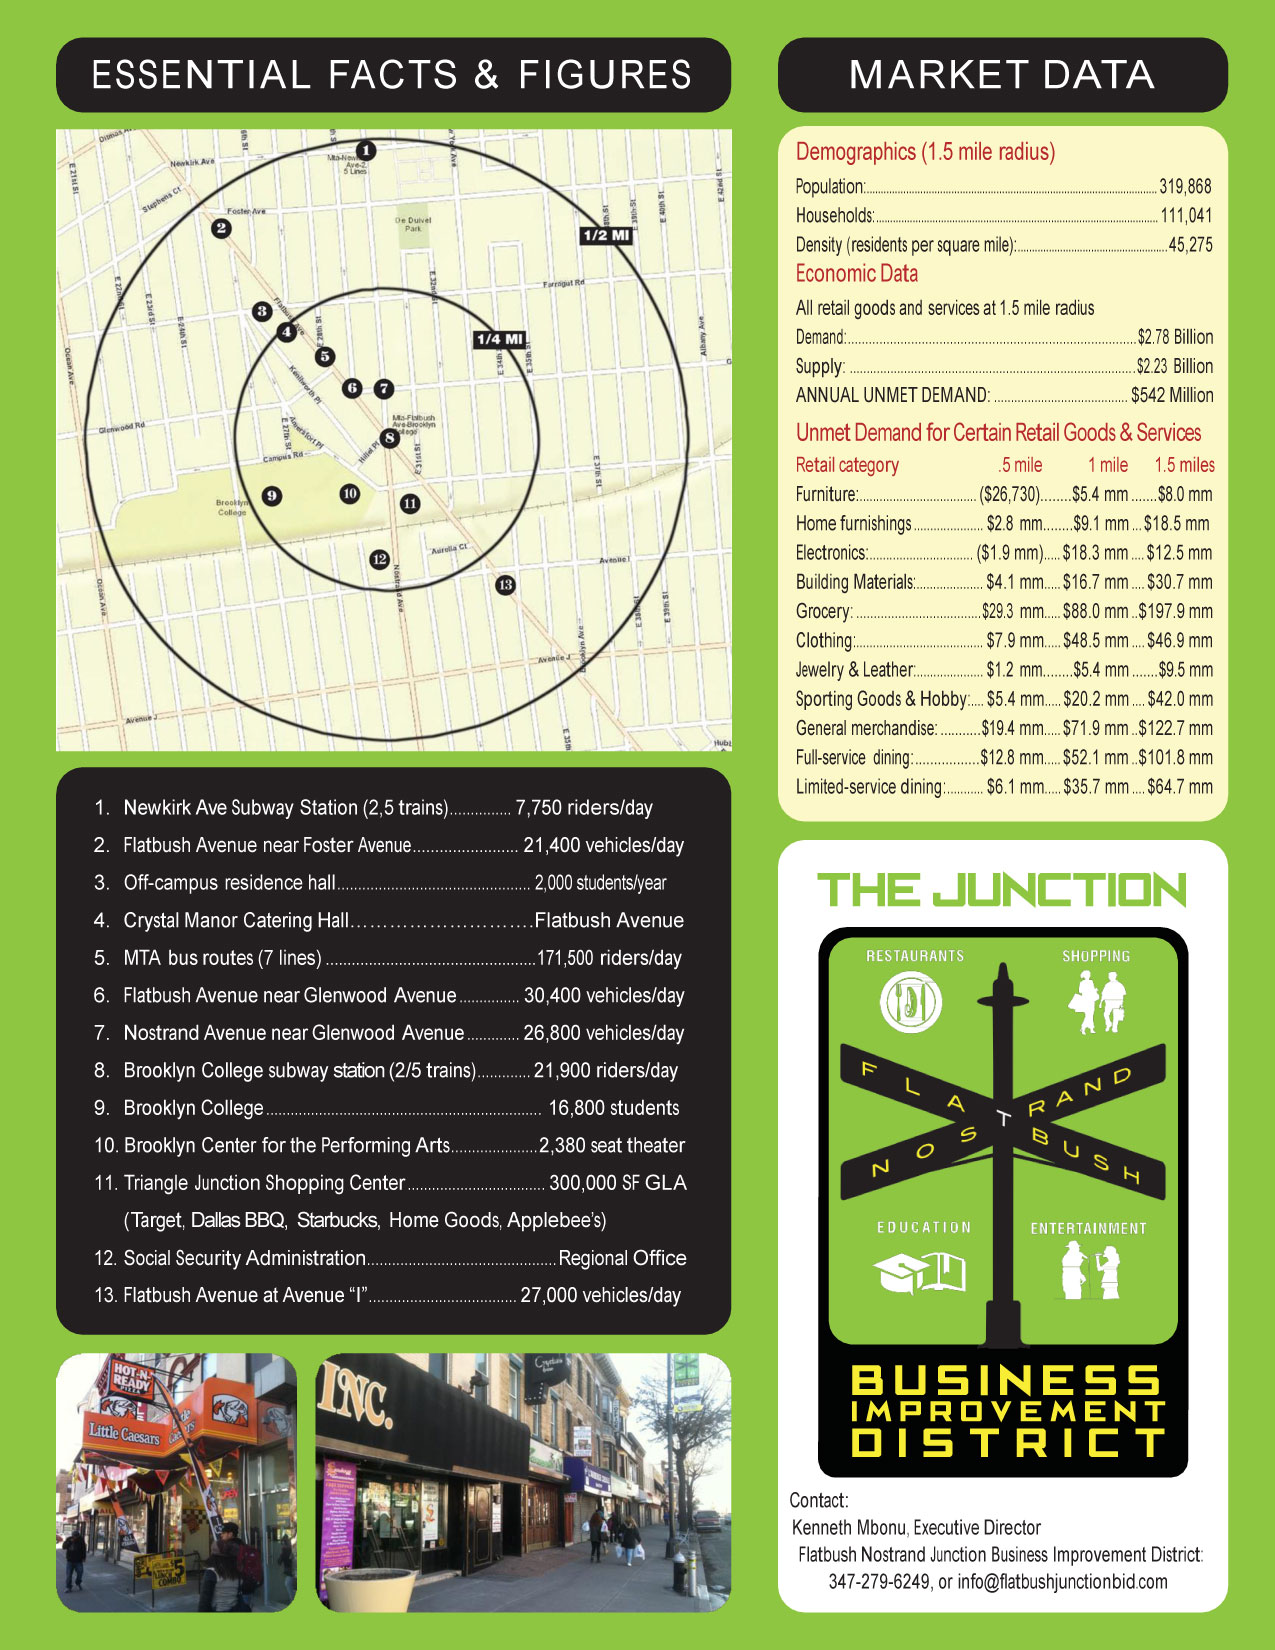 BID Data Flatbush Junction Business Improvement District